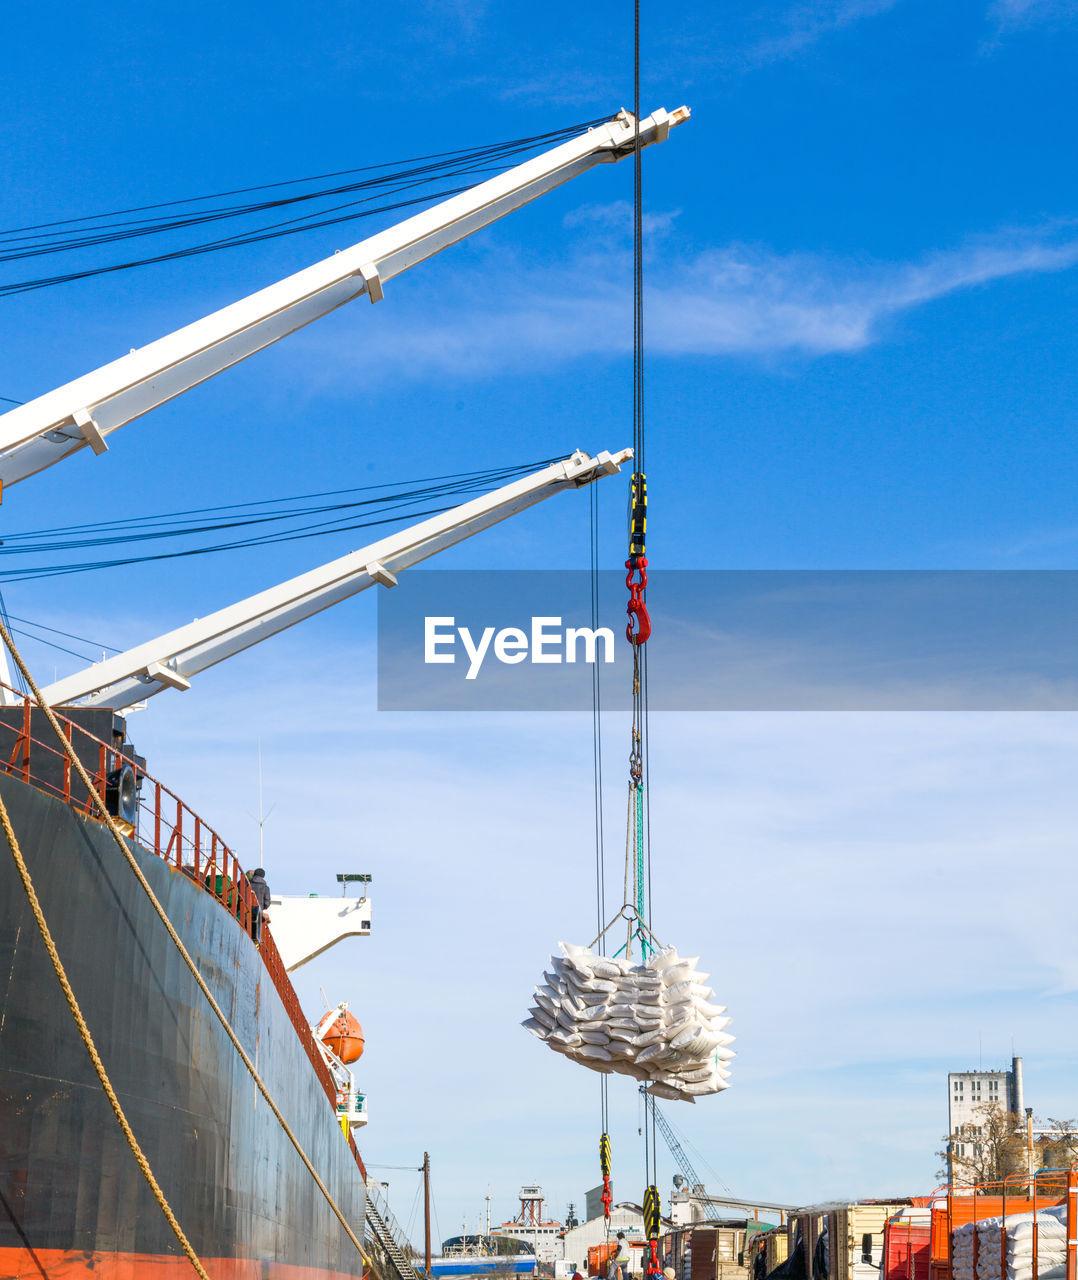 Loading tons of grain onto large overseas ship